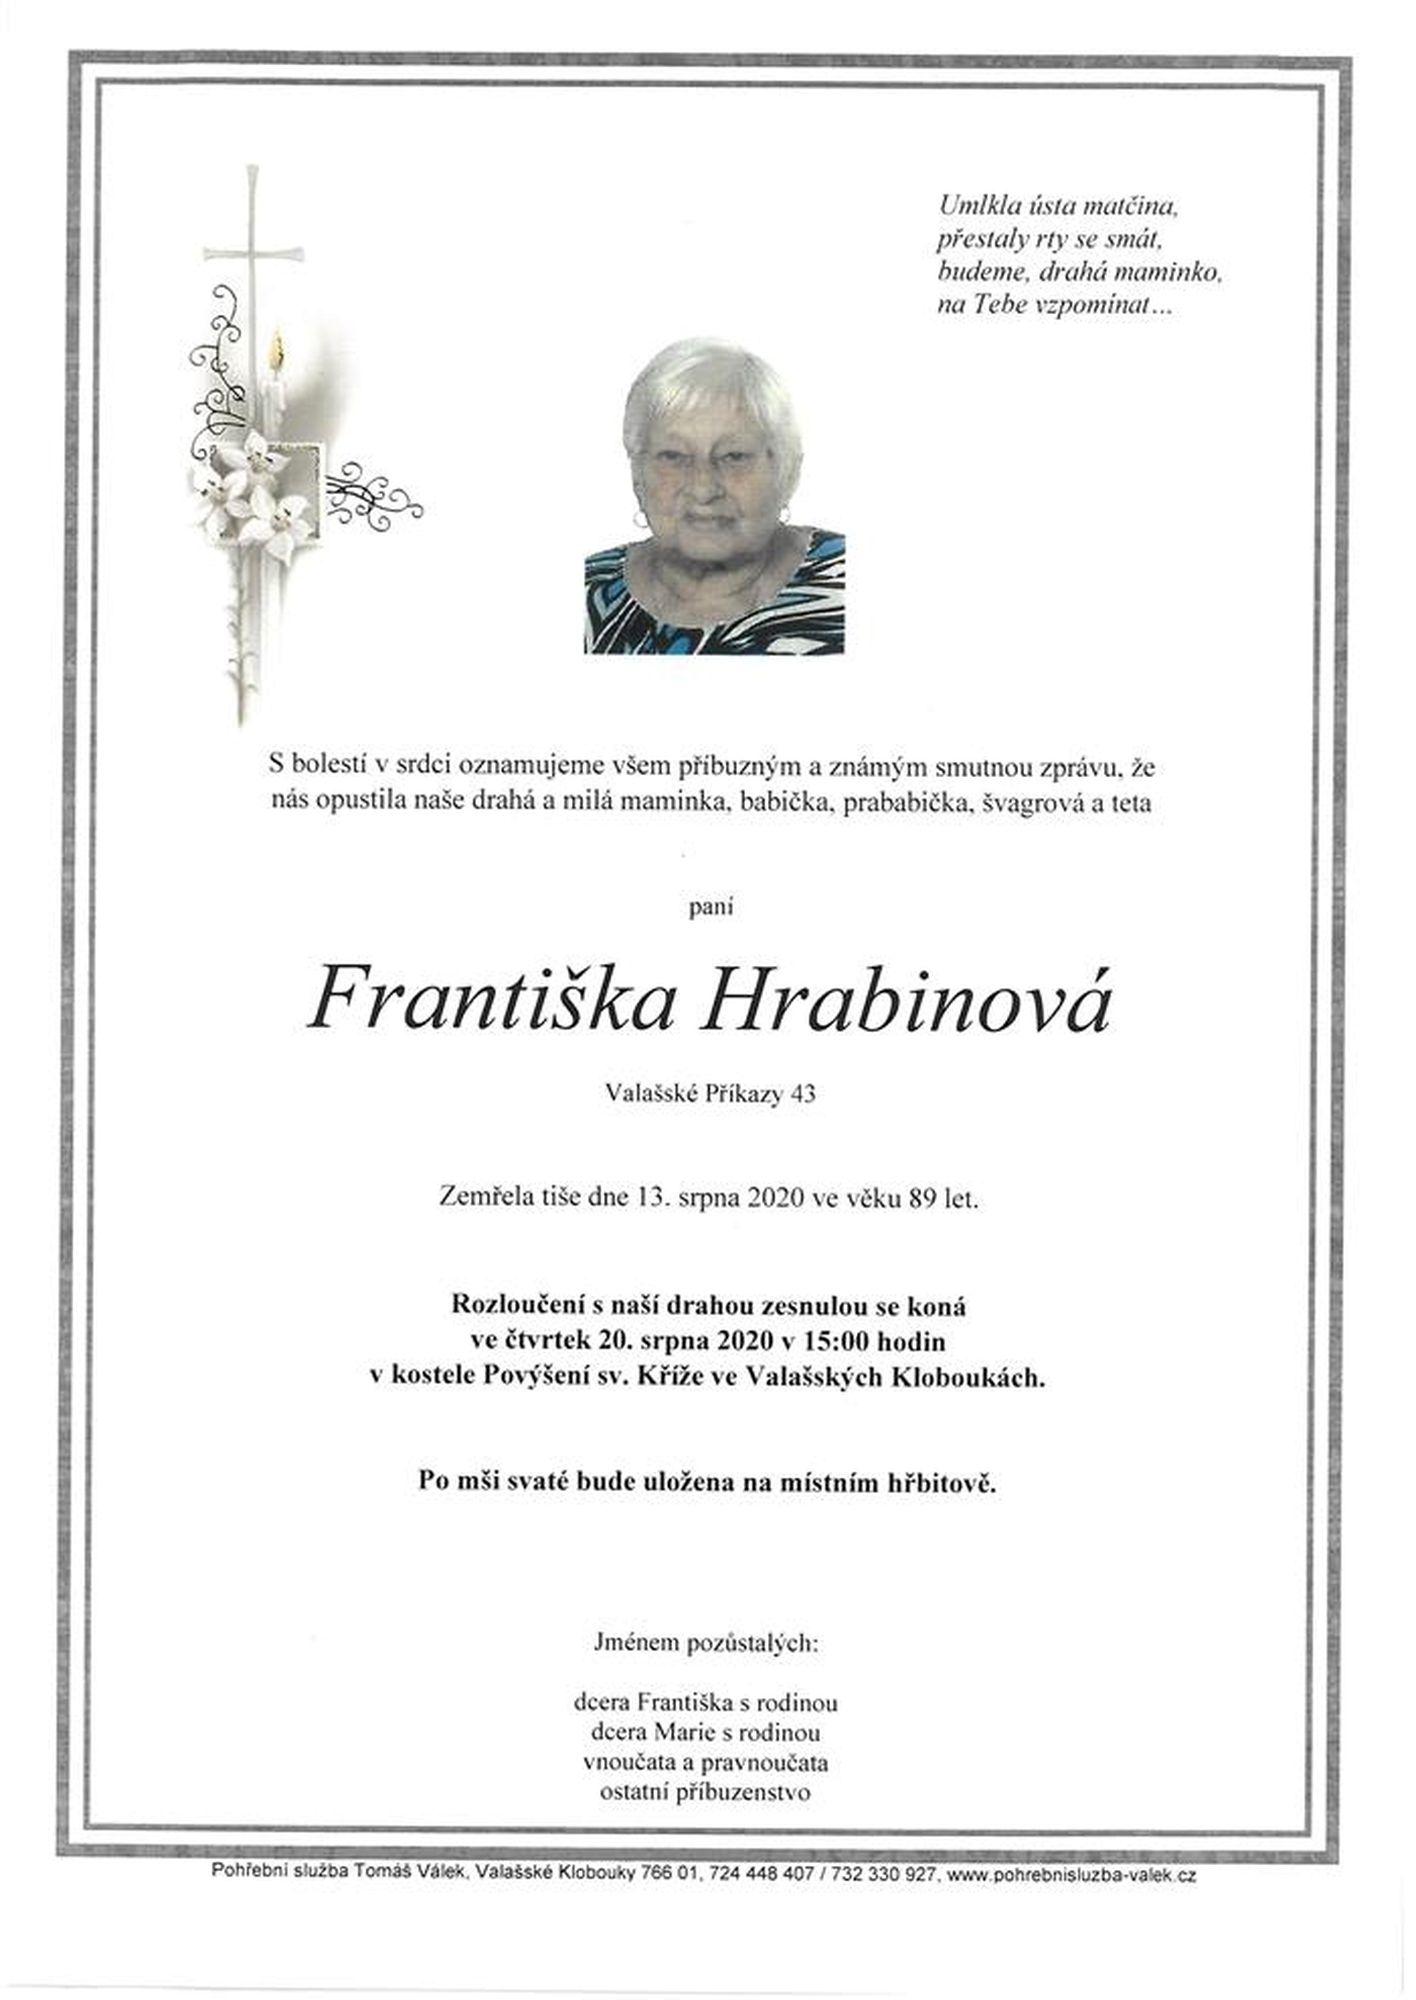 Františka Hrabinová